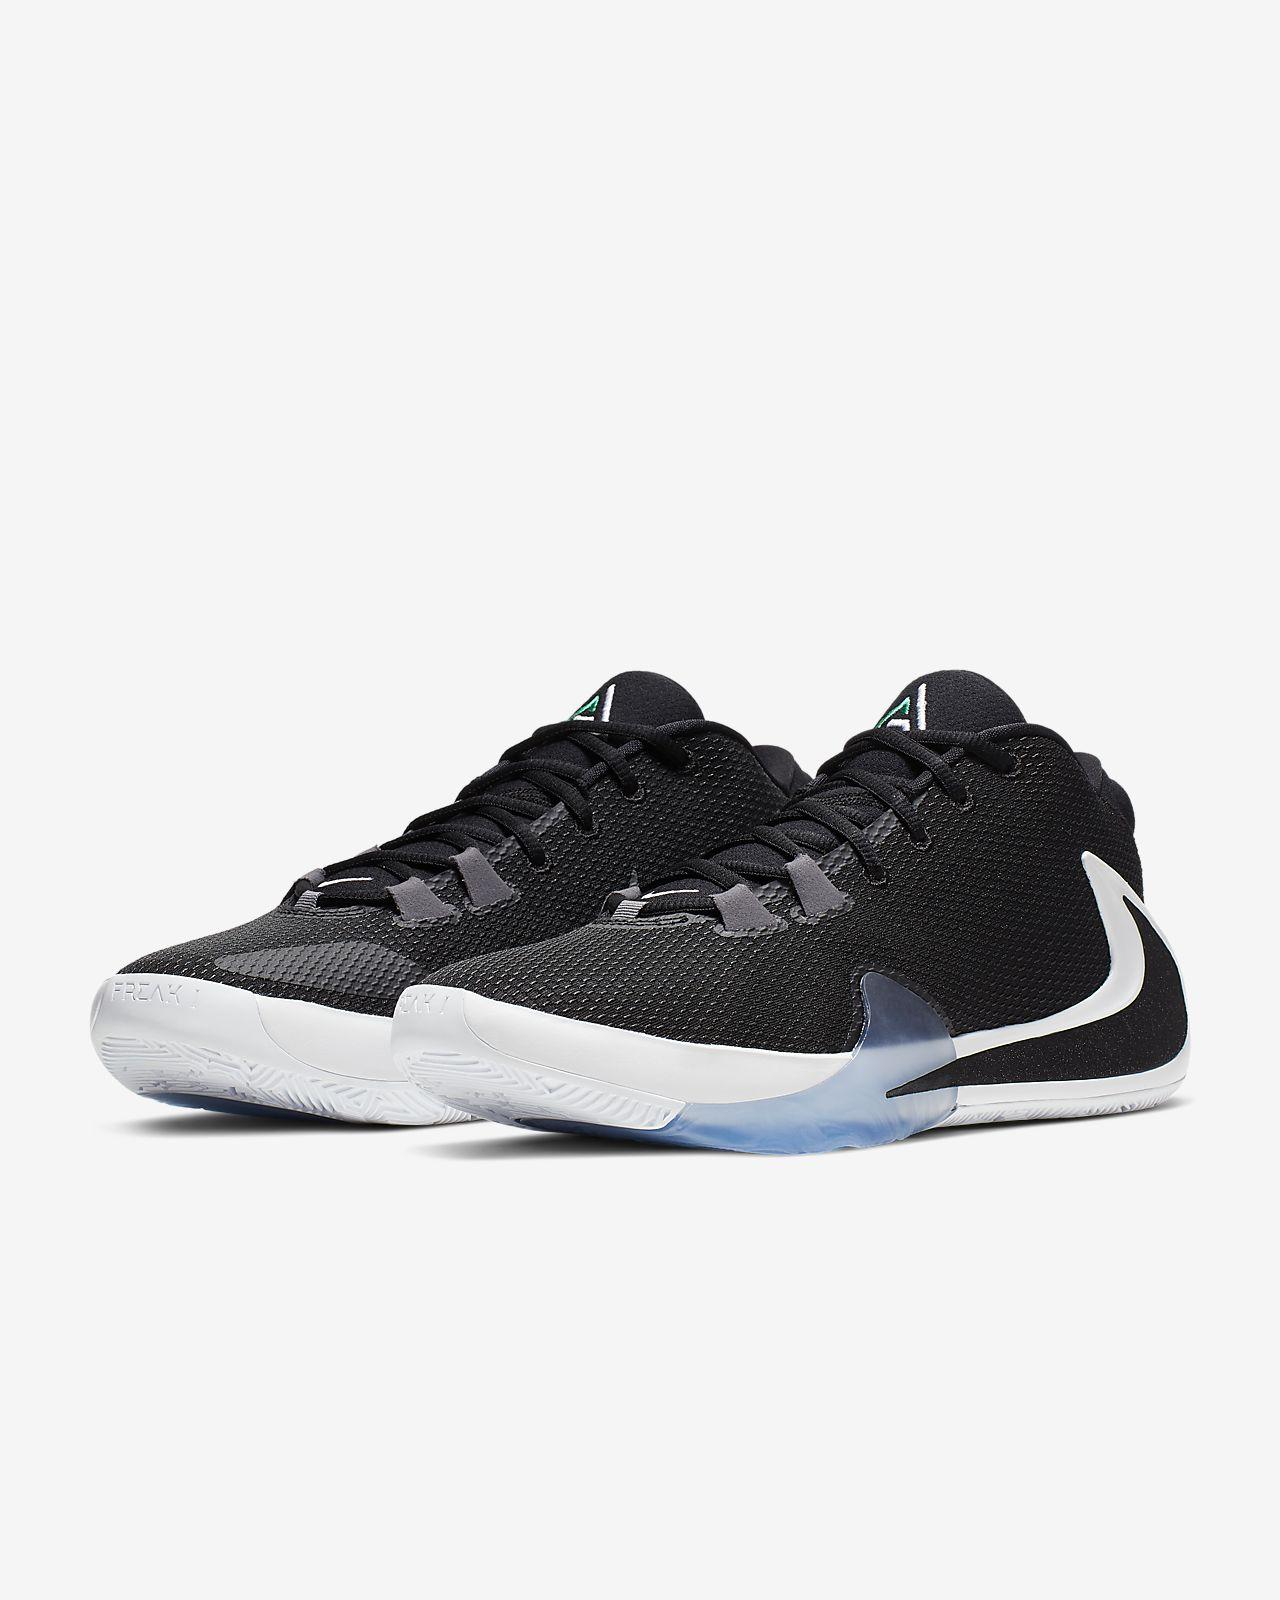 90fe2bd15b3ab Zoom Freak 1 Basketball Shoe